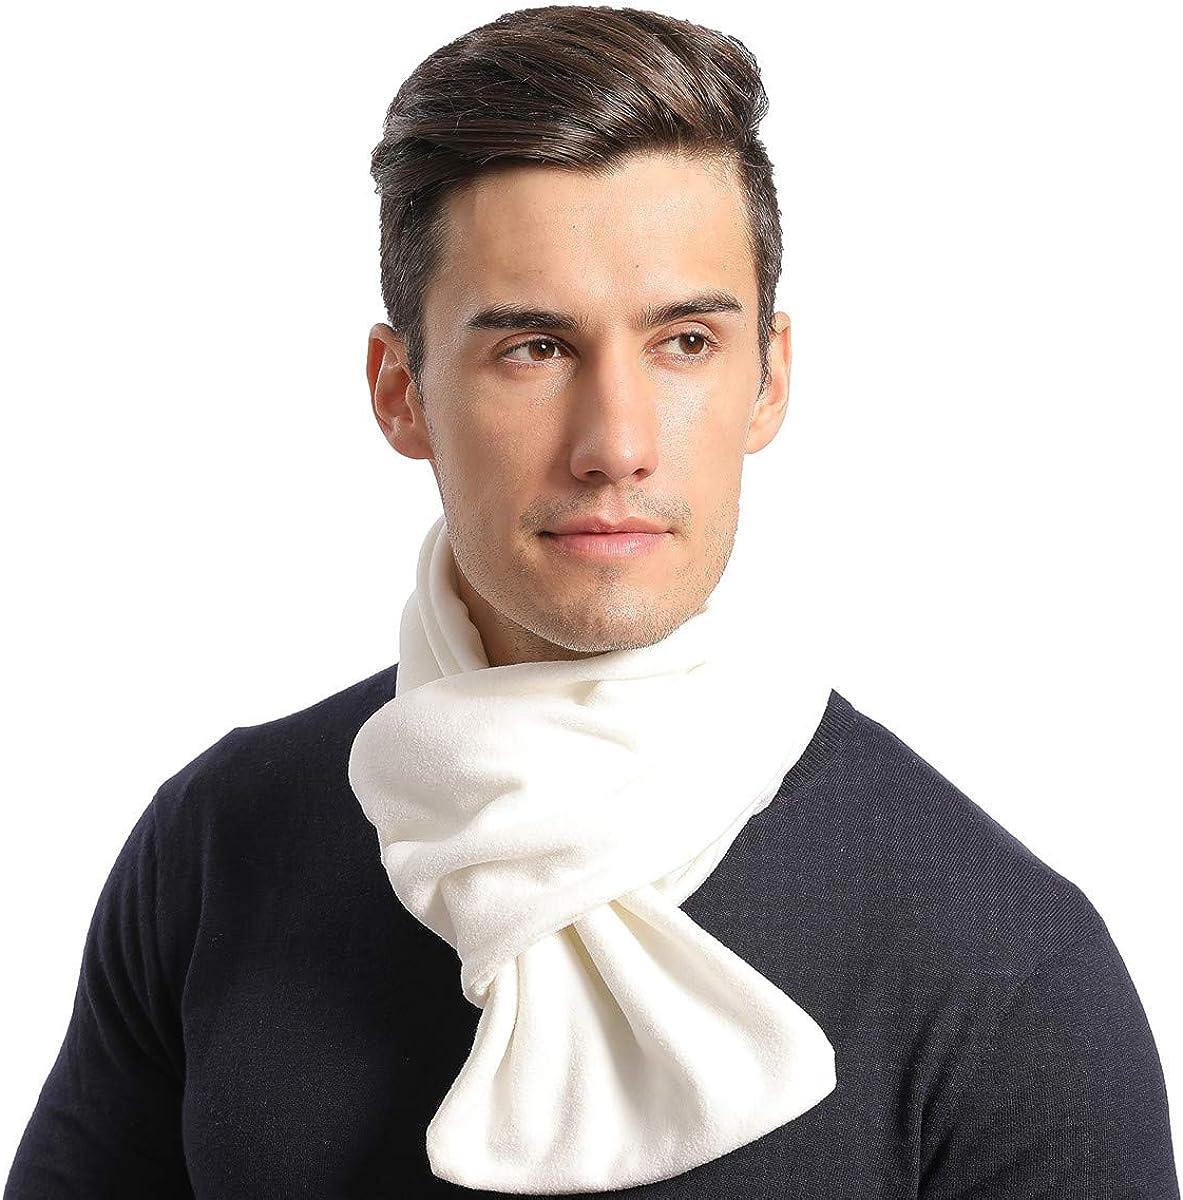 NovForth Neck Warmer Scarf Snoods for Men Women Scarves Unisex Thermal Windproof with Super Soft Polar Fleece Elegant Gift